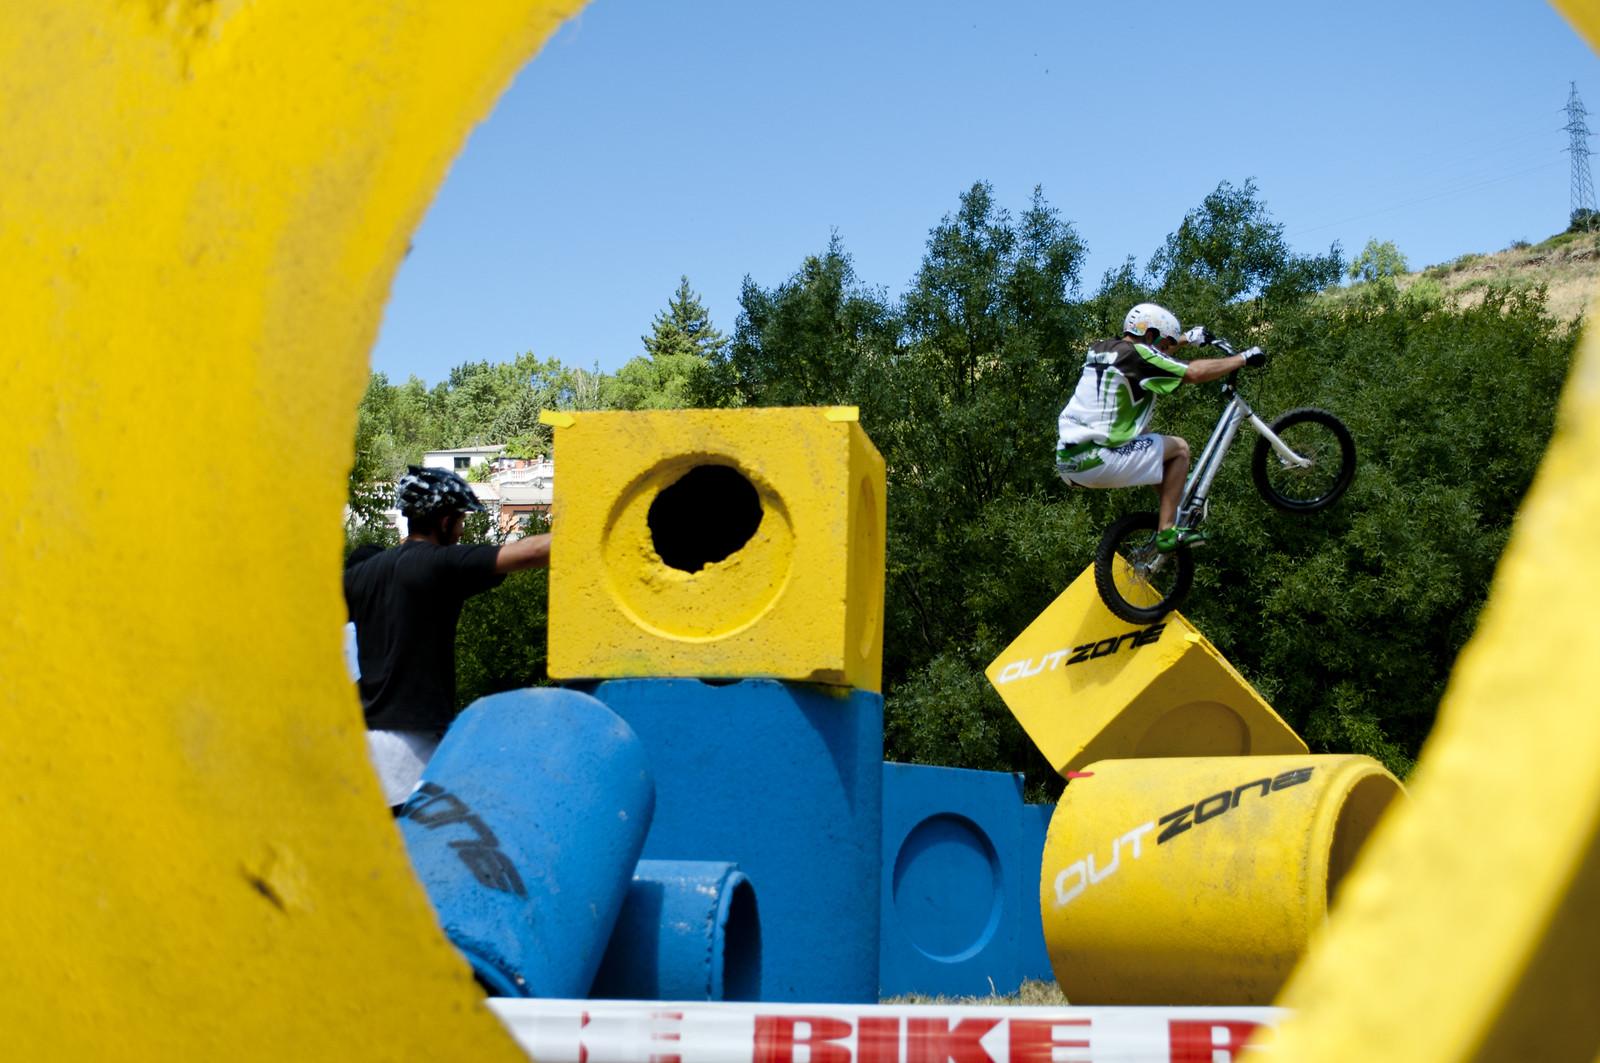 DSC 6634 - A.Cubino - Mountain Biking Pictures - Vital MTB